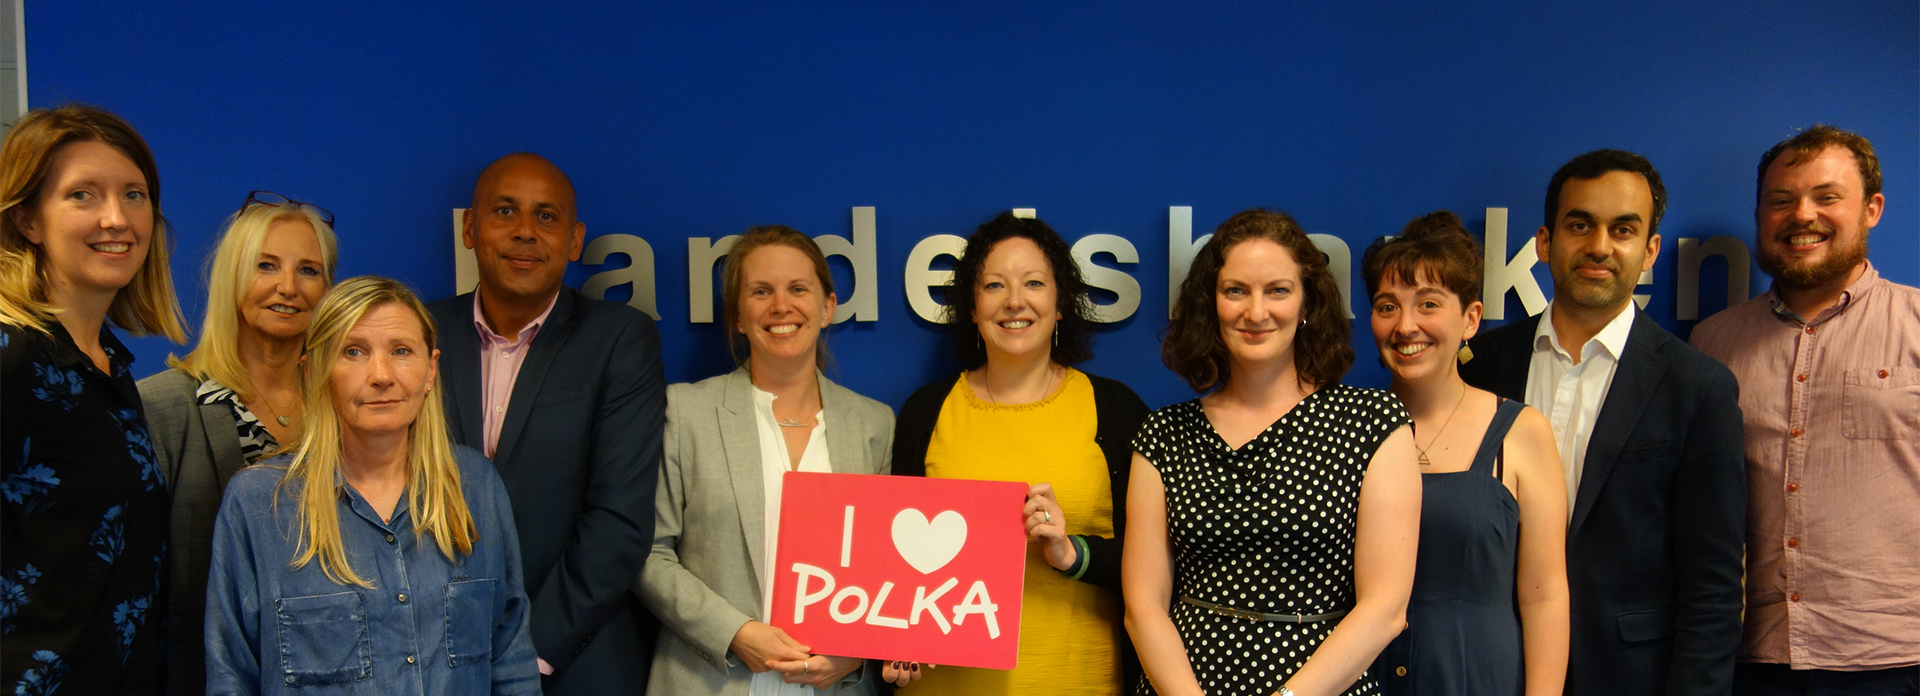 polka staff and corporates